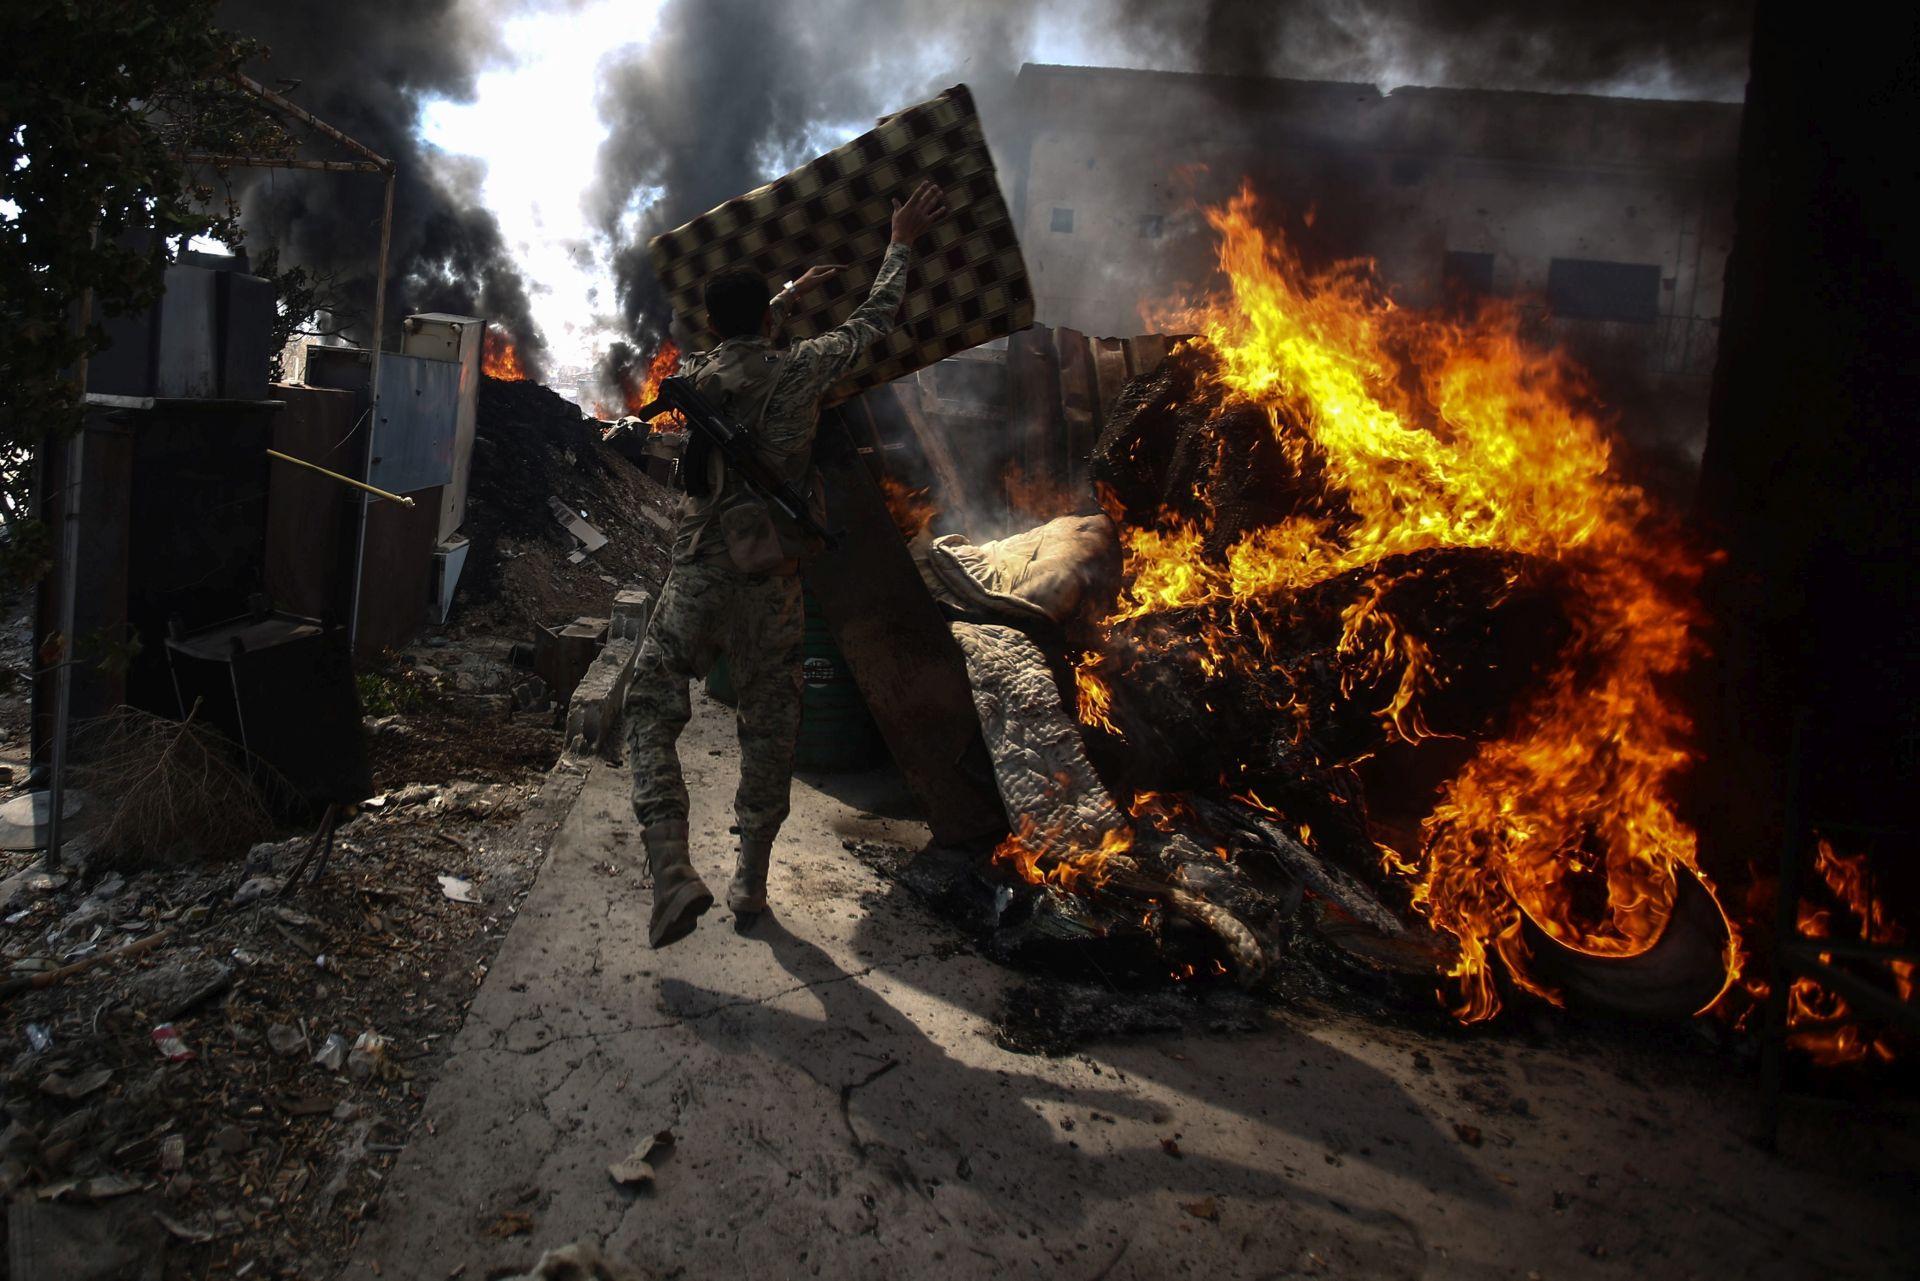 SIRIJSKA VOJSKA: Primirje u Siriji je završeno